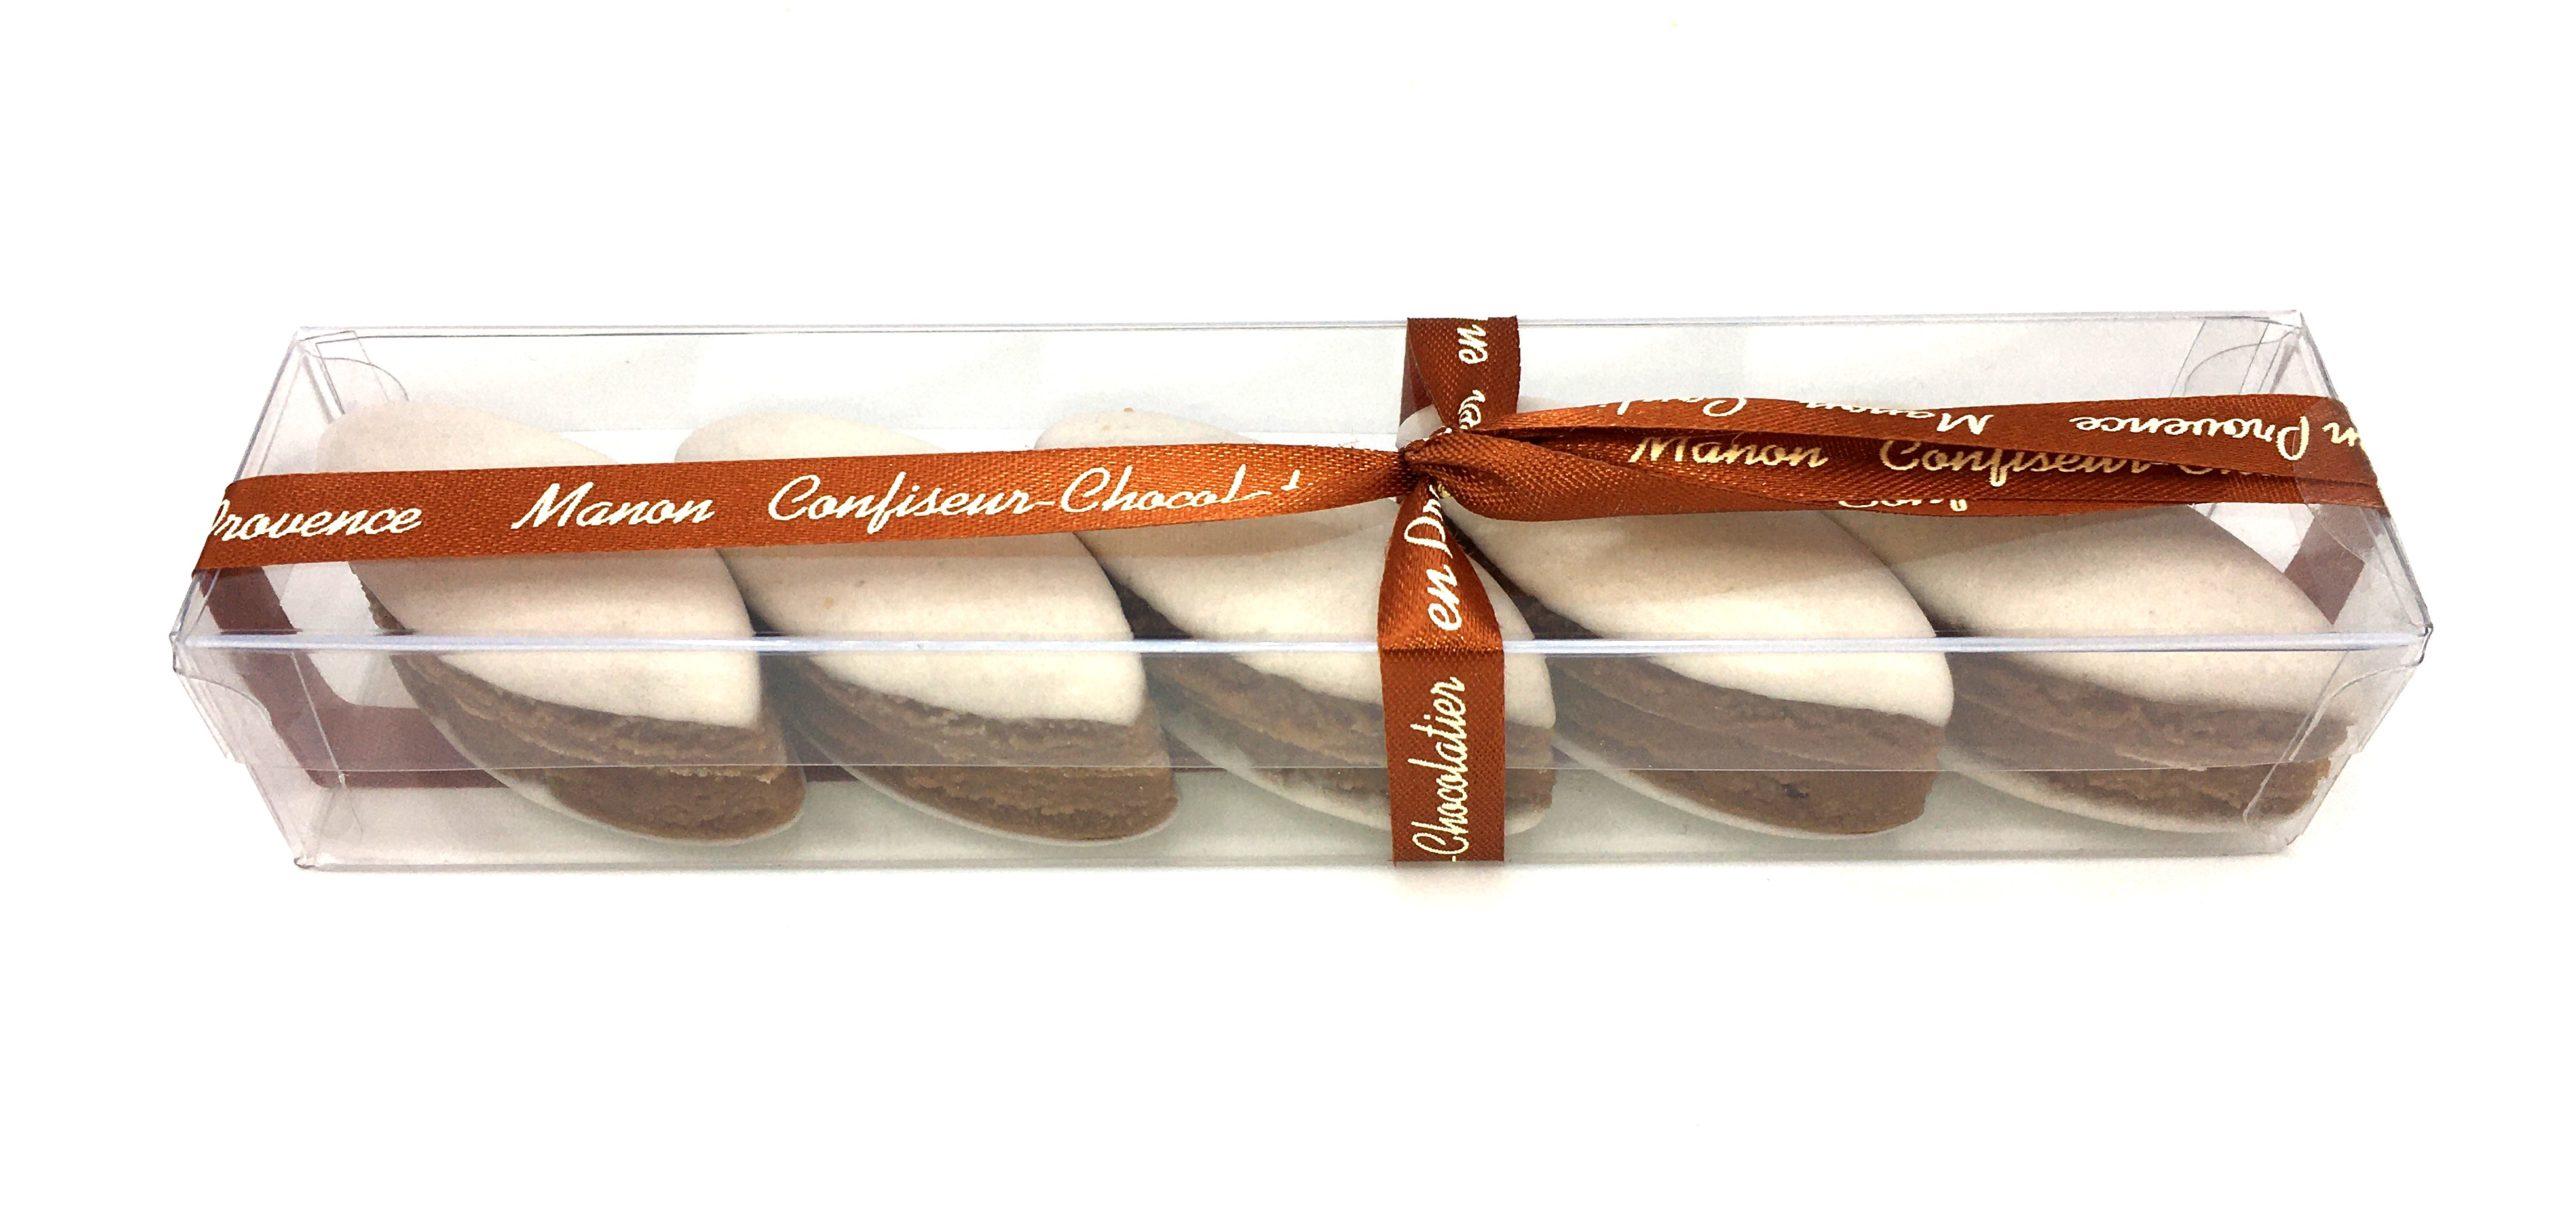 Calissons chocolat noisettes Manon